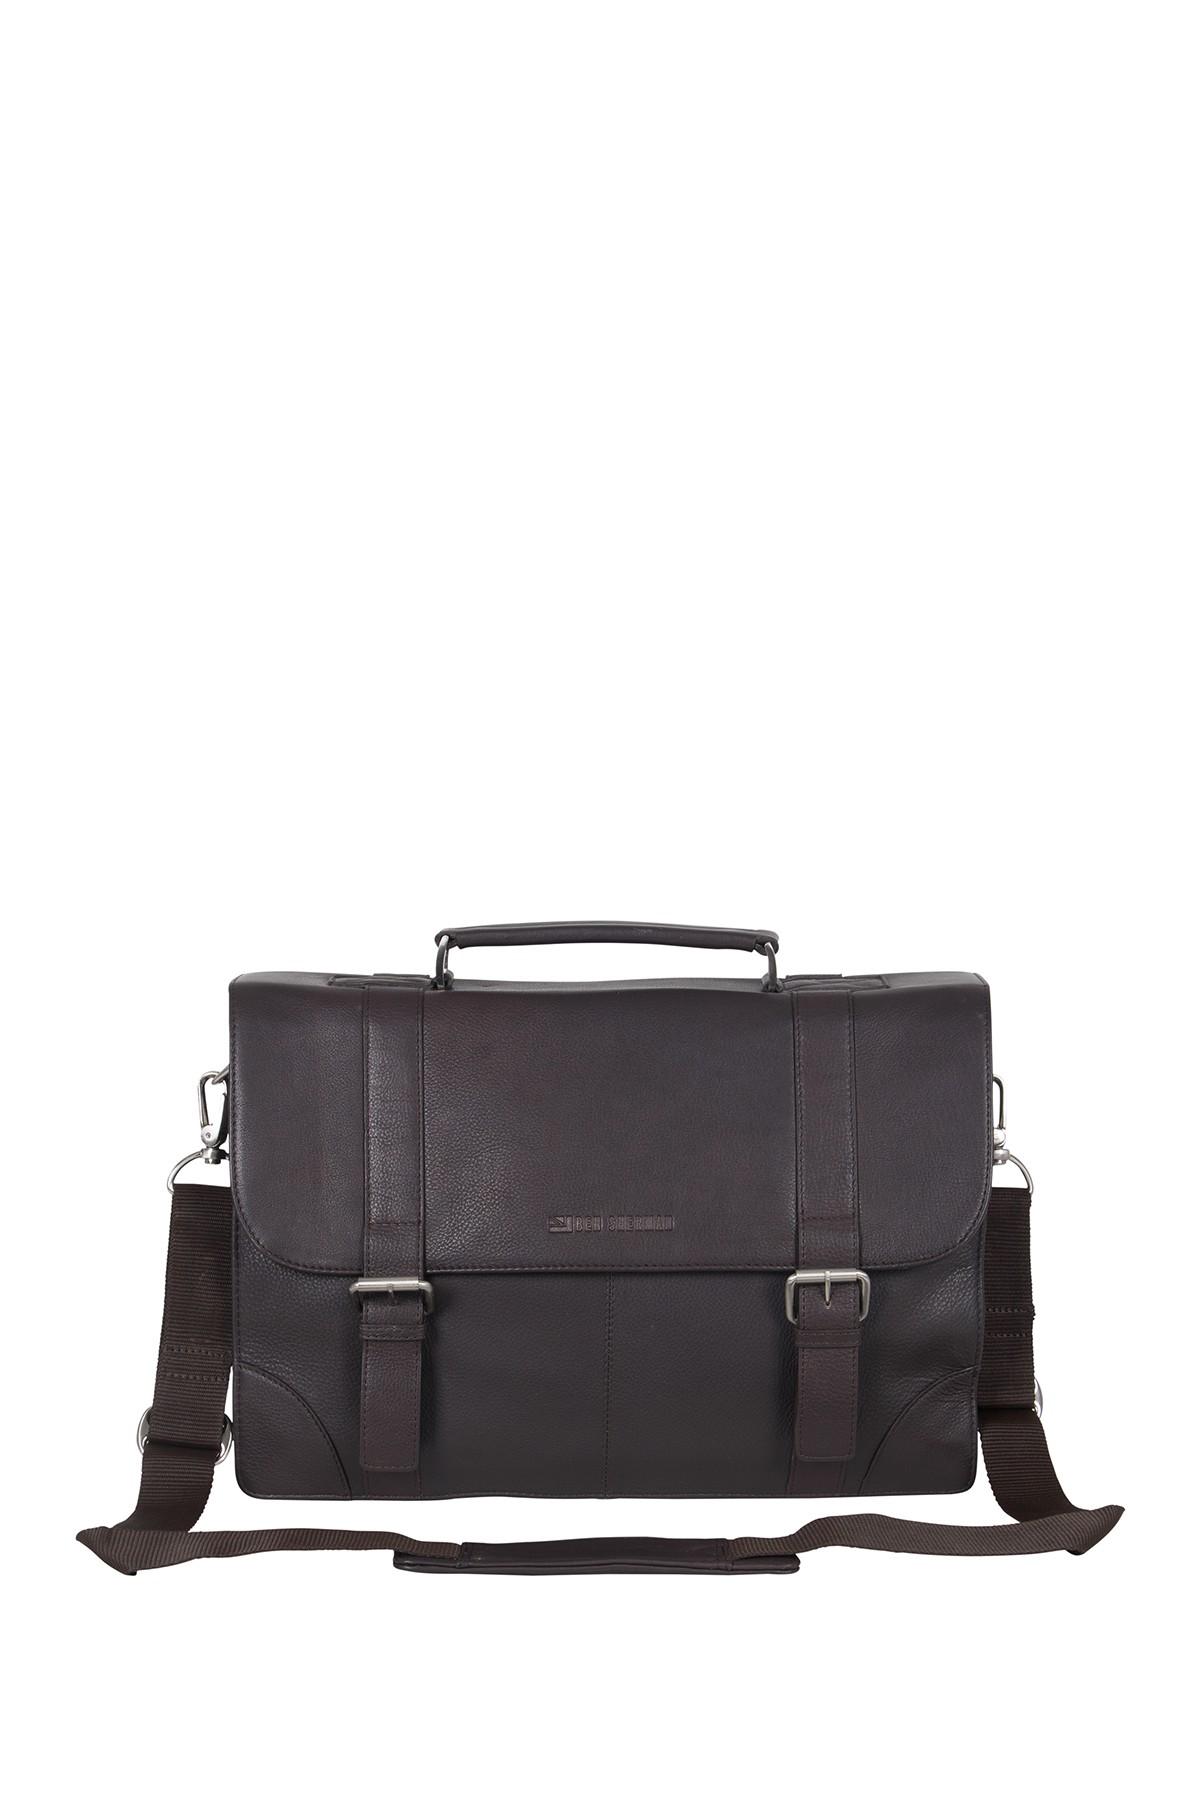 Premium Karino Leather Double Compartment Laptop Case